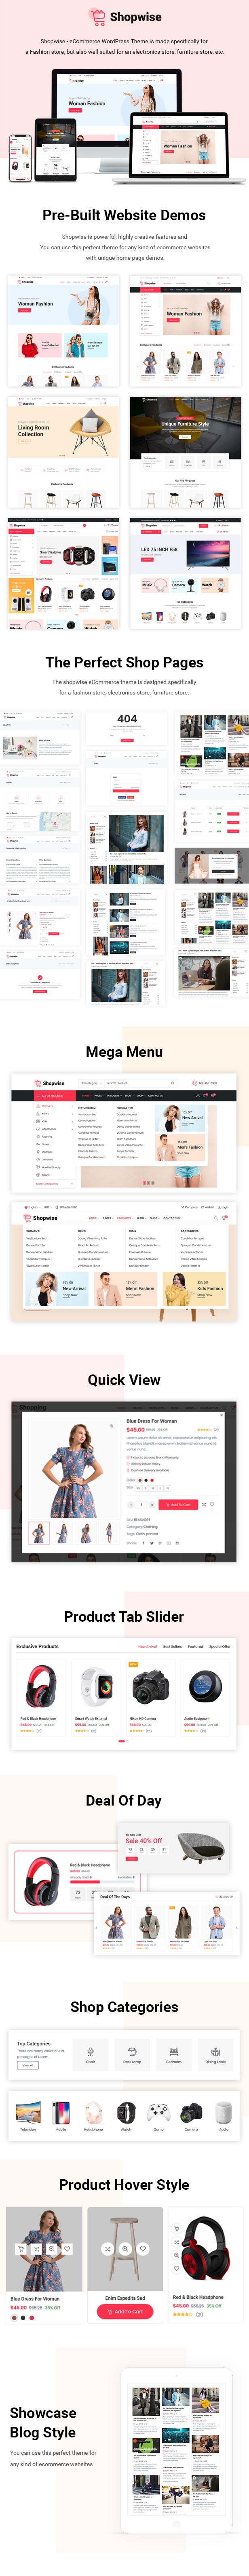 Shopwise - Minimales WooCommerce WordPress Theme - 3